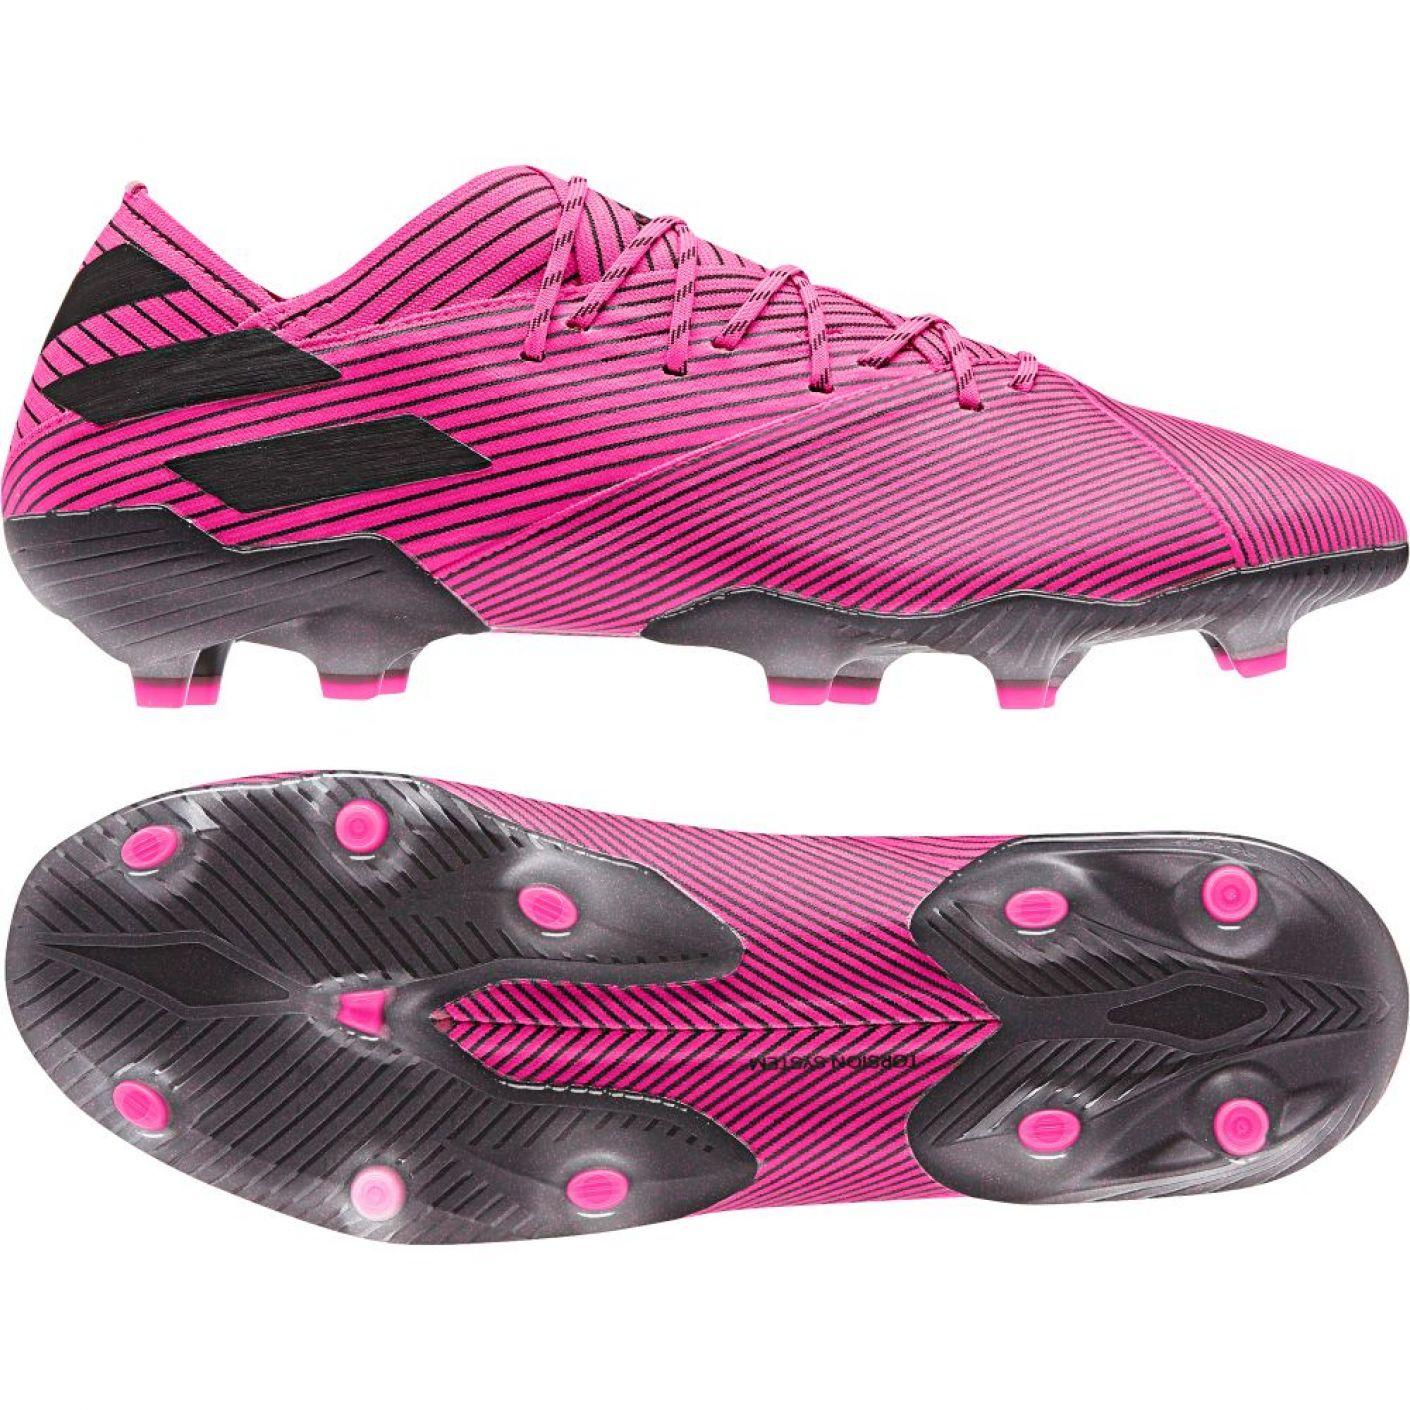 adidas NEMEZIZ 19.1 Gras Voetbalschoenen (FG) Felroze Zwart